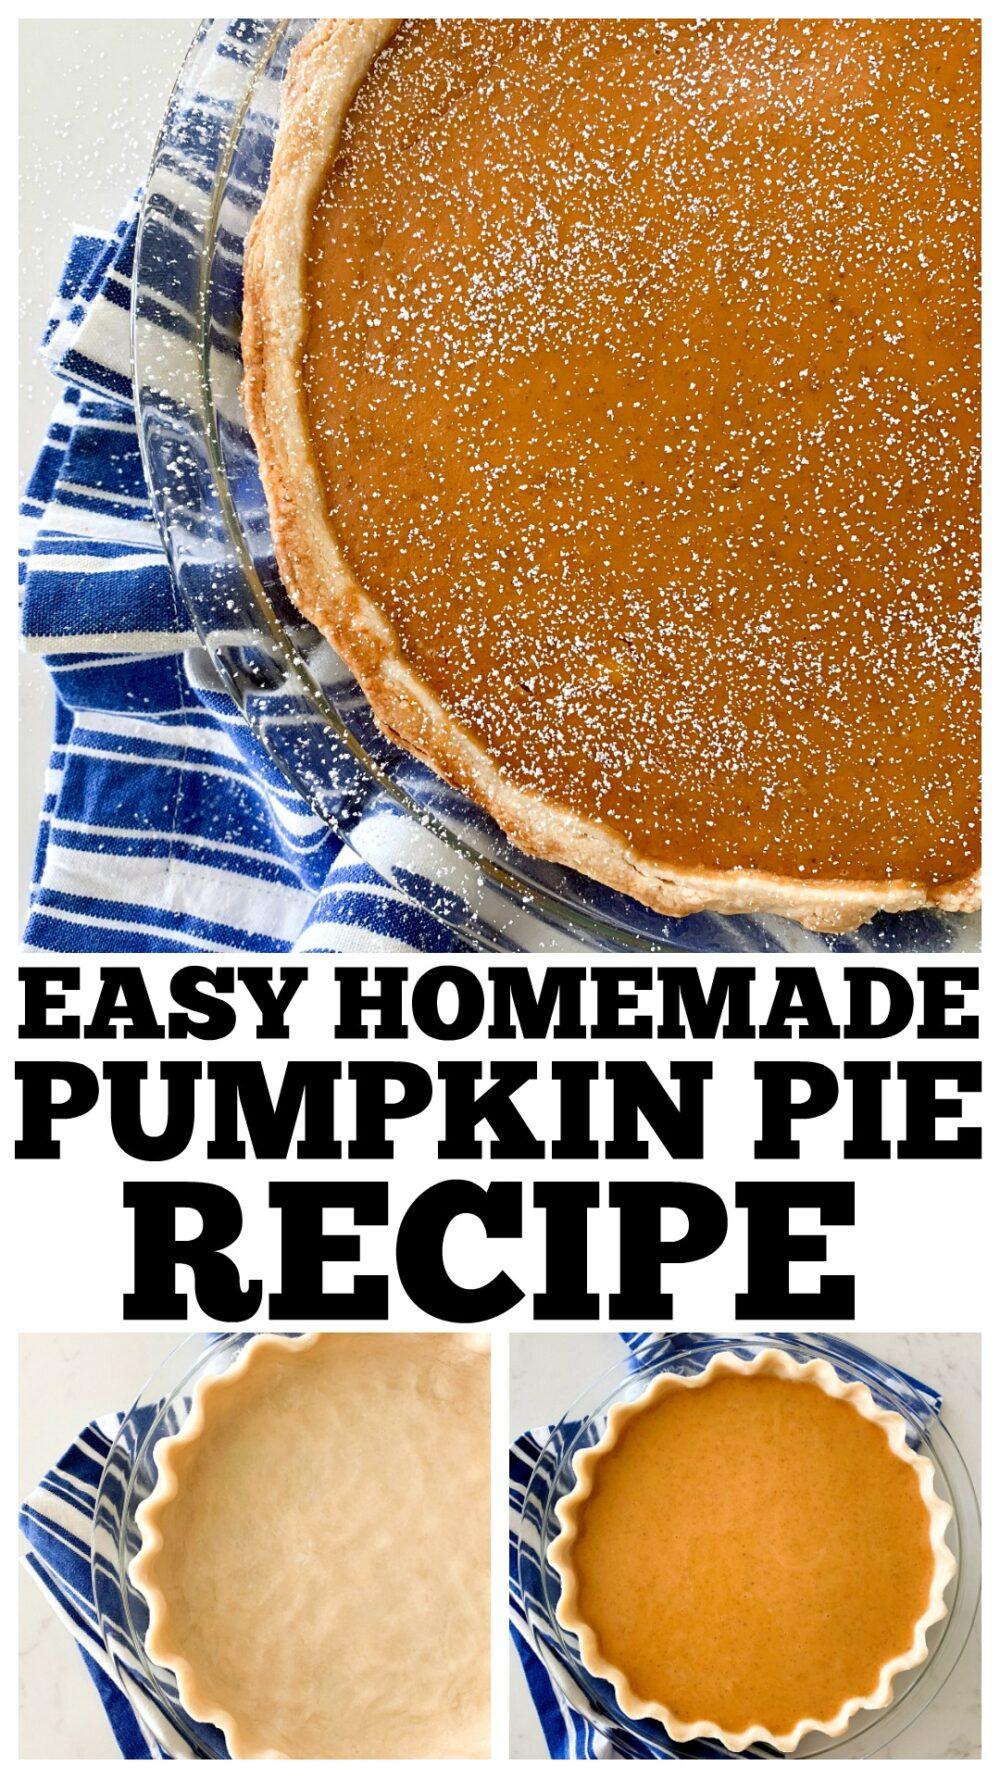 photo collage of pumpkin pie recipe